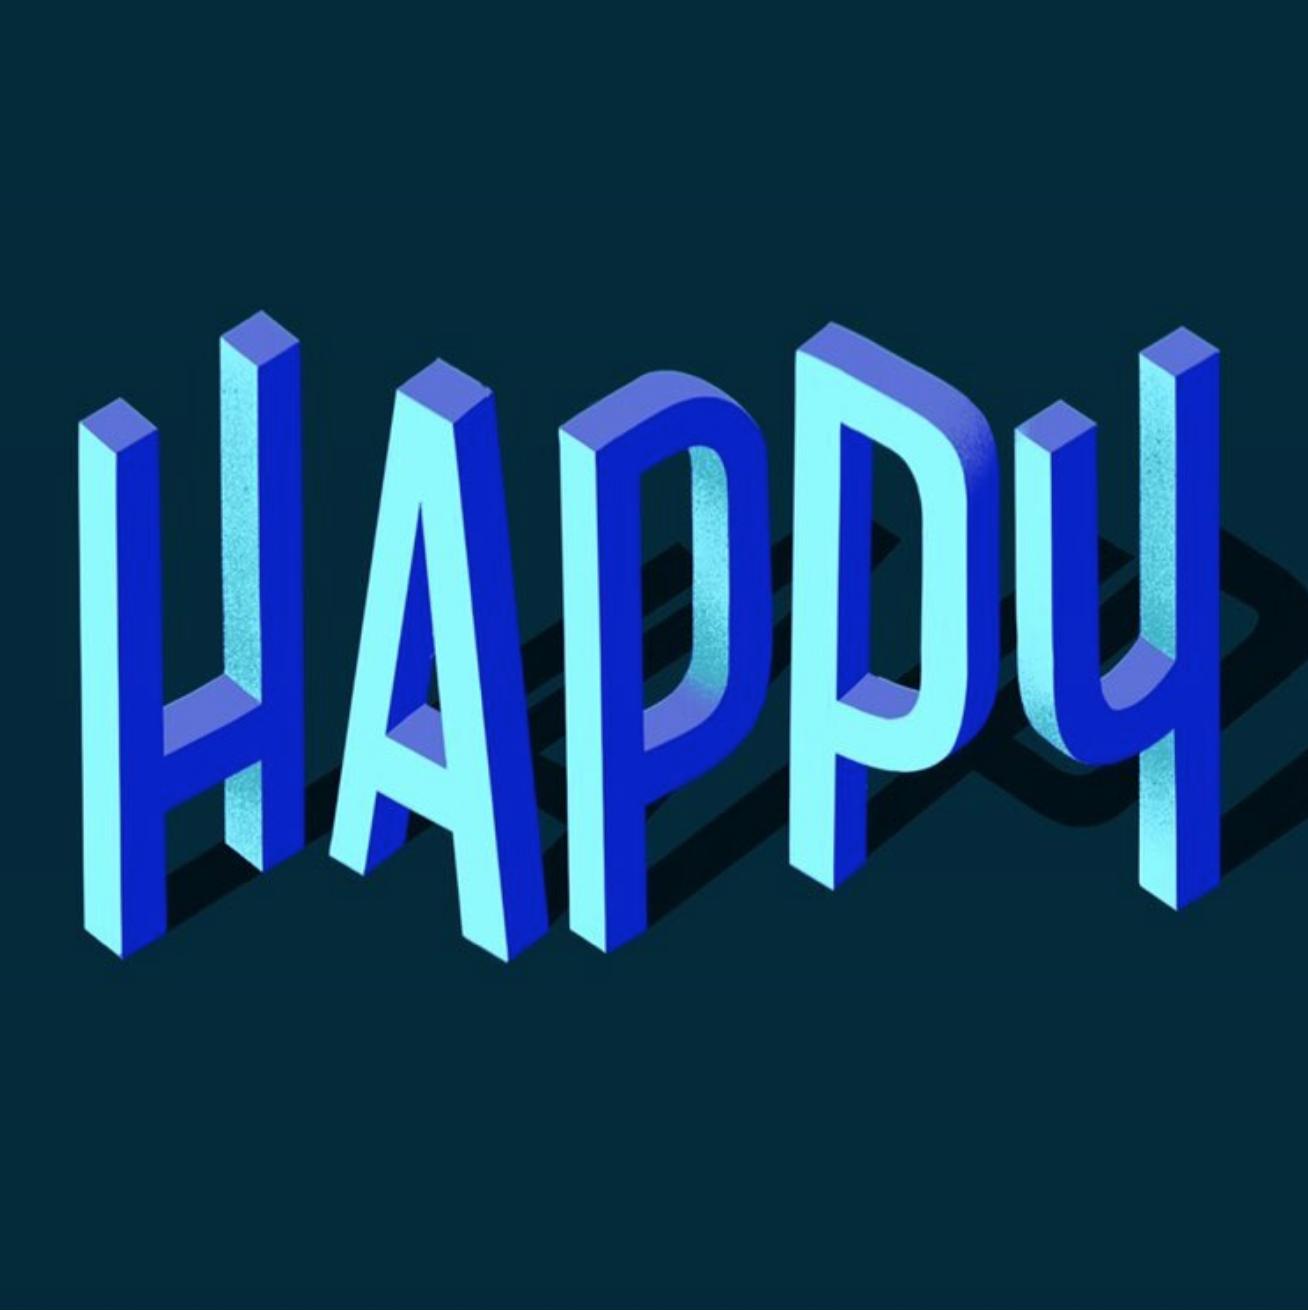 RJP_3D_Happy.png